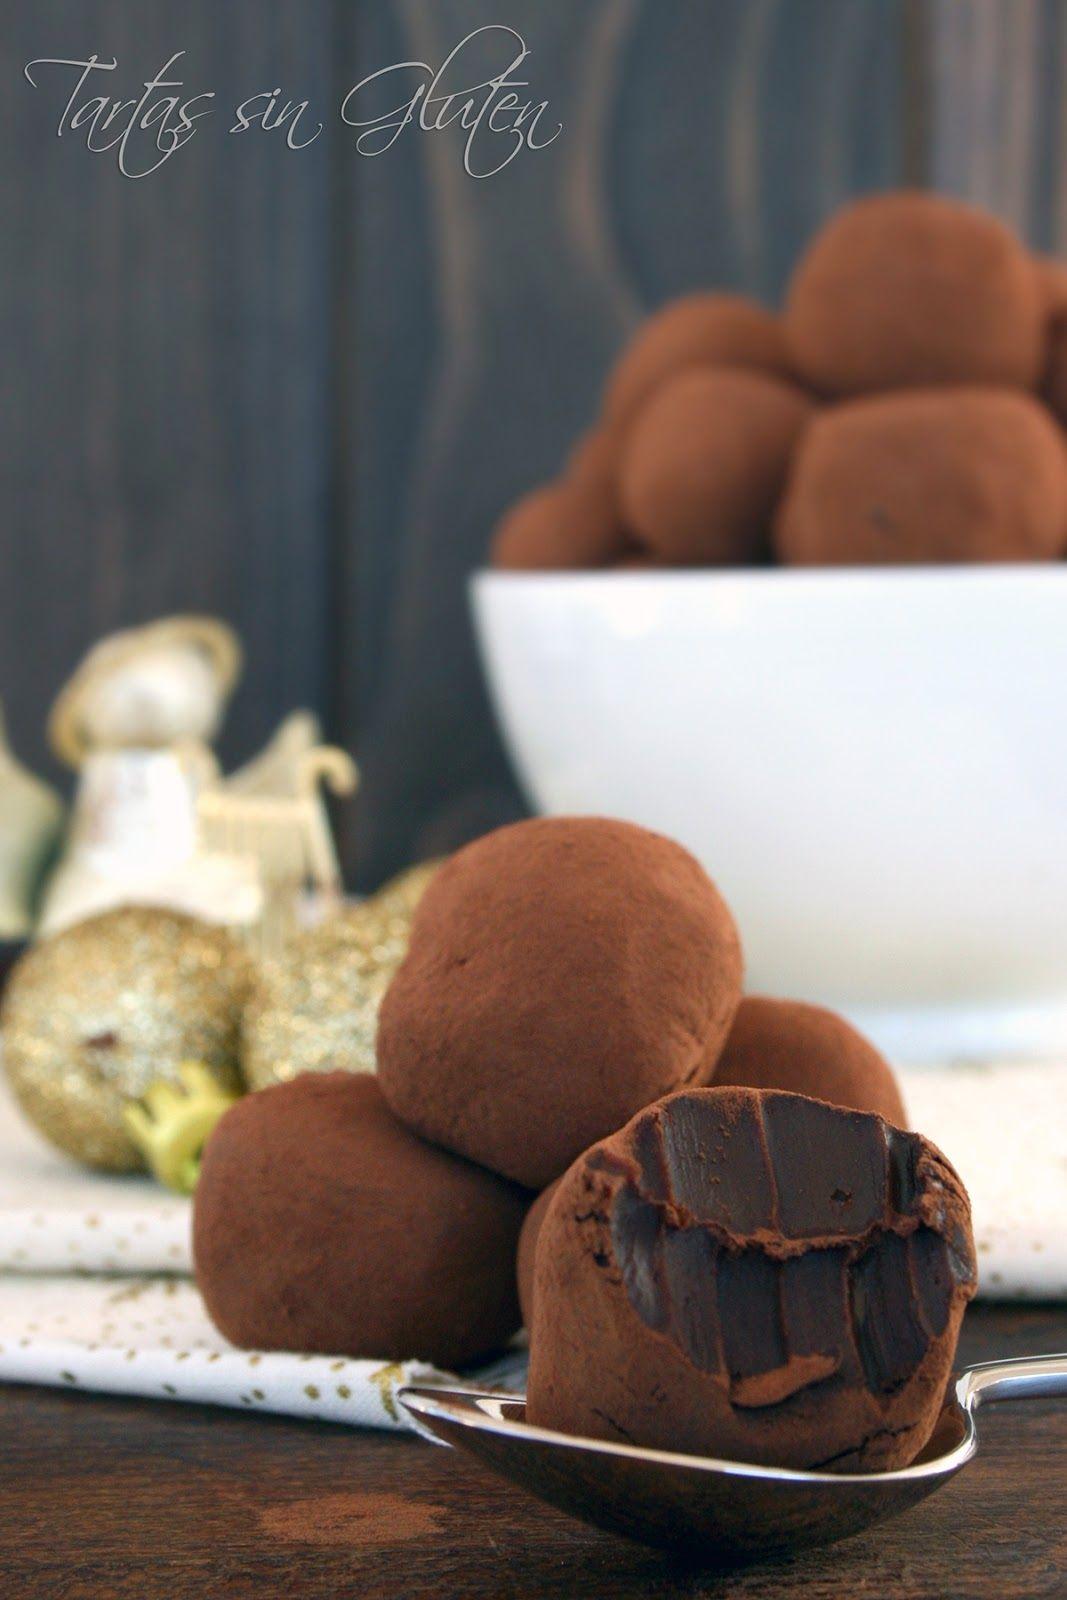 Tartas sin Gluten .....365 dias sin gluten: Trufas de Nutella ...